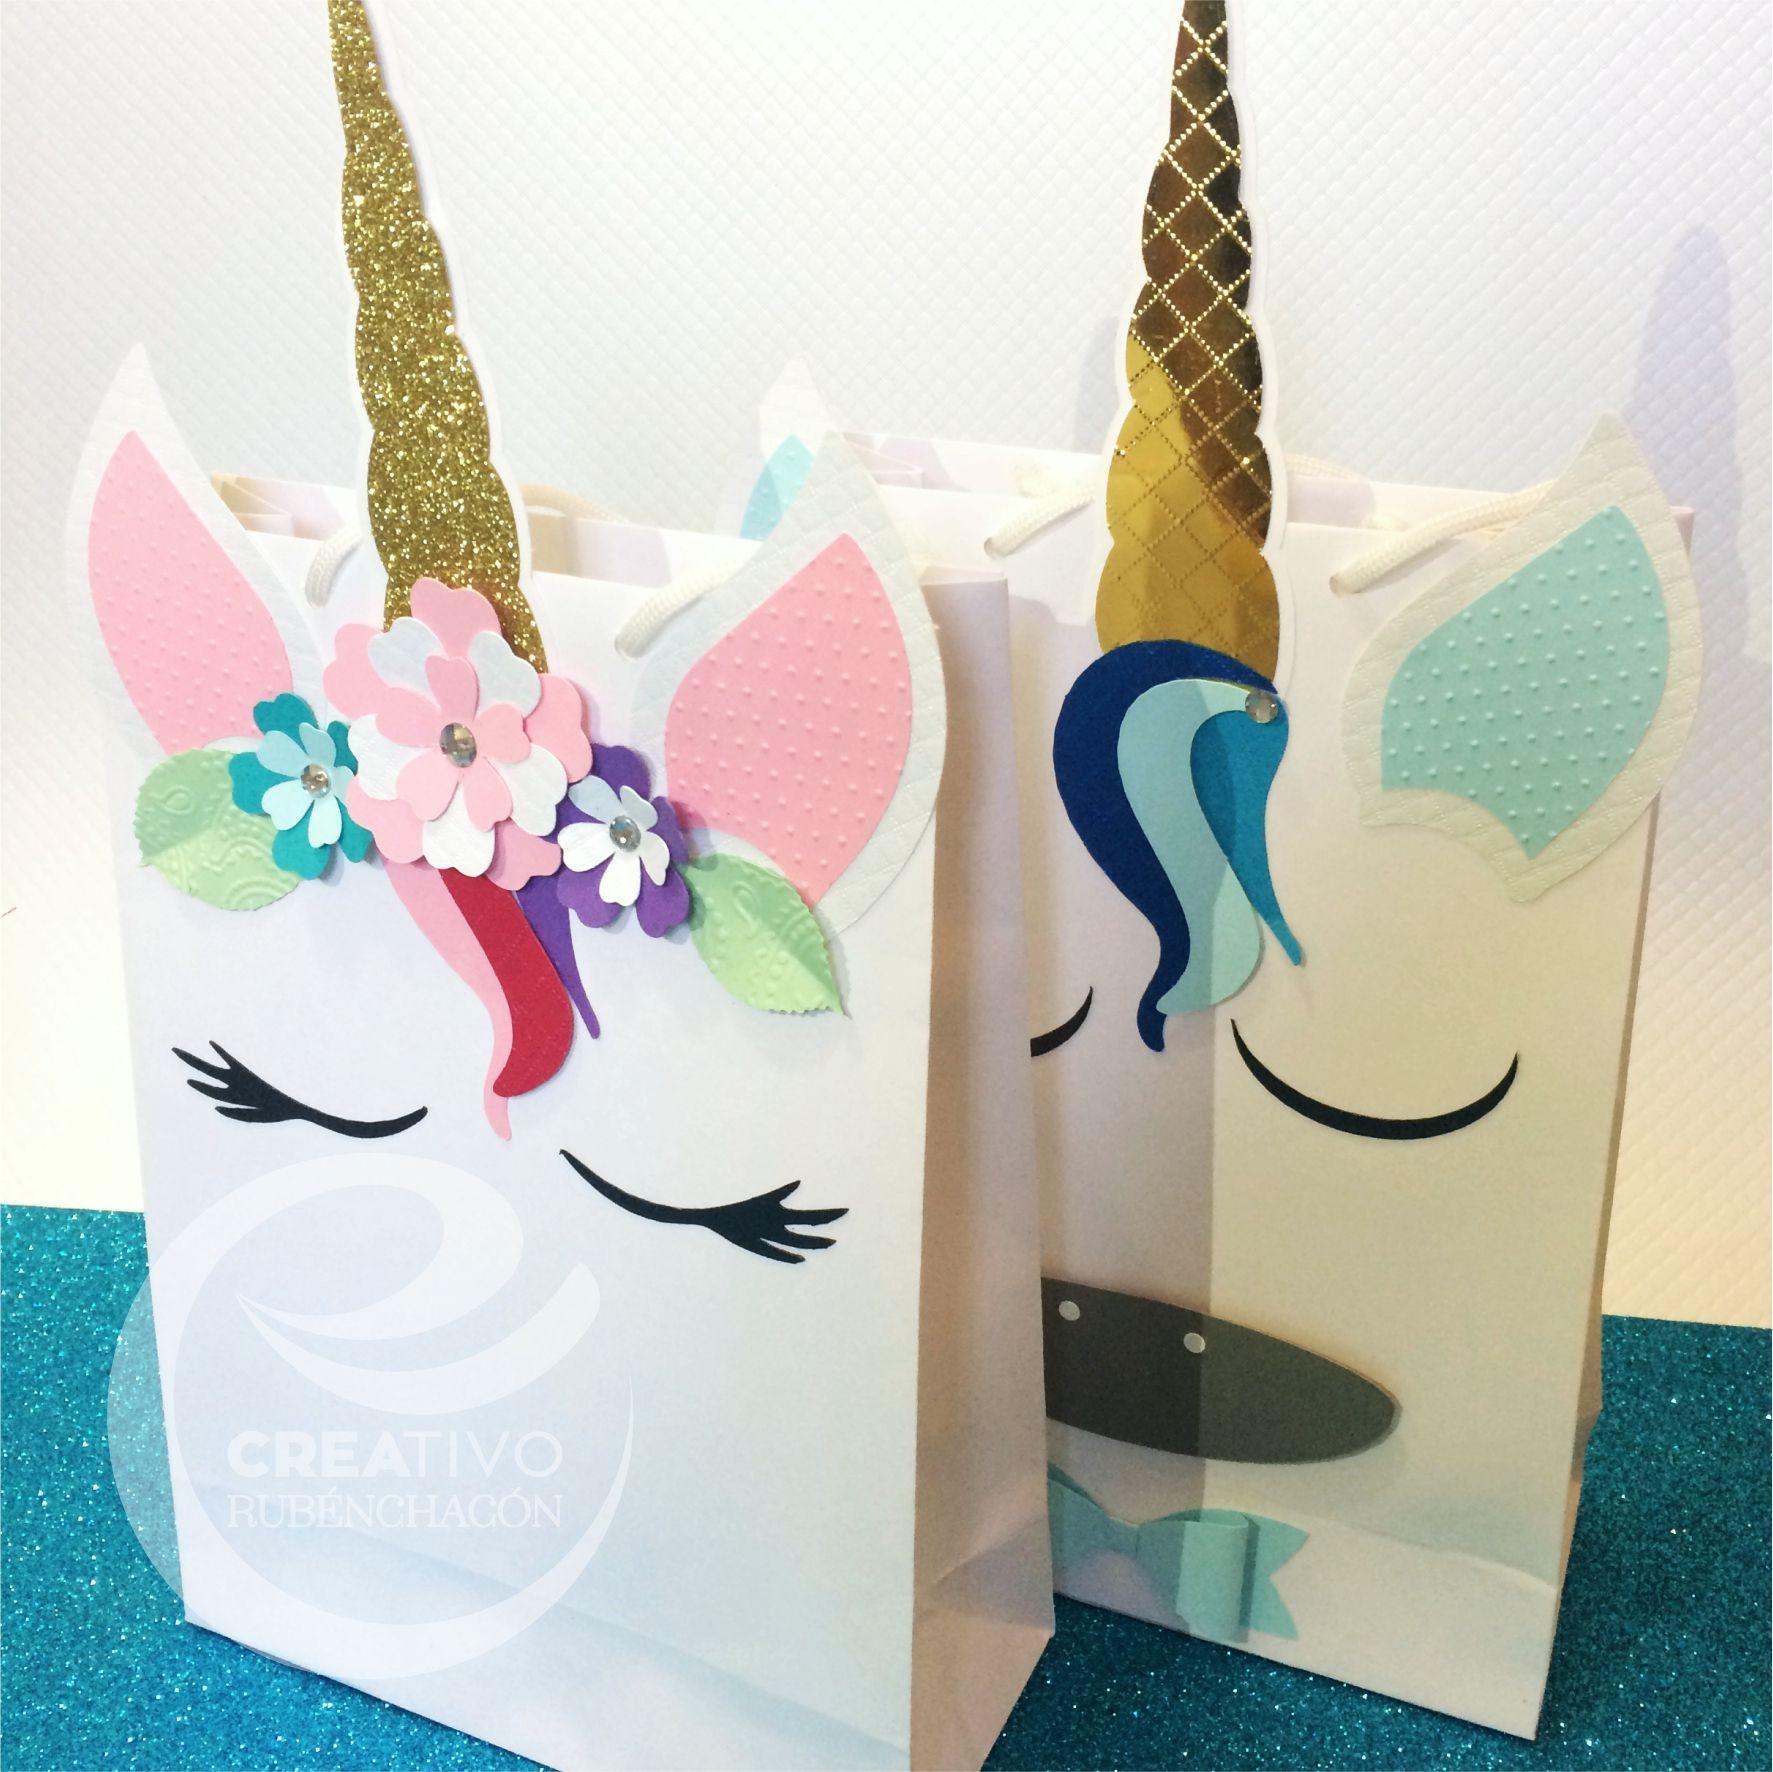 8b1298f67 Custom Unicorn Bags - Bolsas personalizadas de Unicornio. #custom  #stationery #bag #party #birthday #miami #canada #creativorubenchacon  #golden #unicor # ...